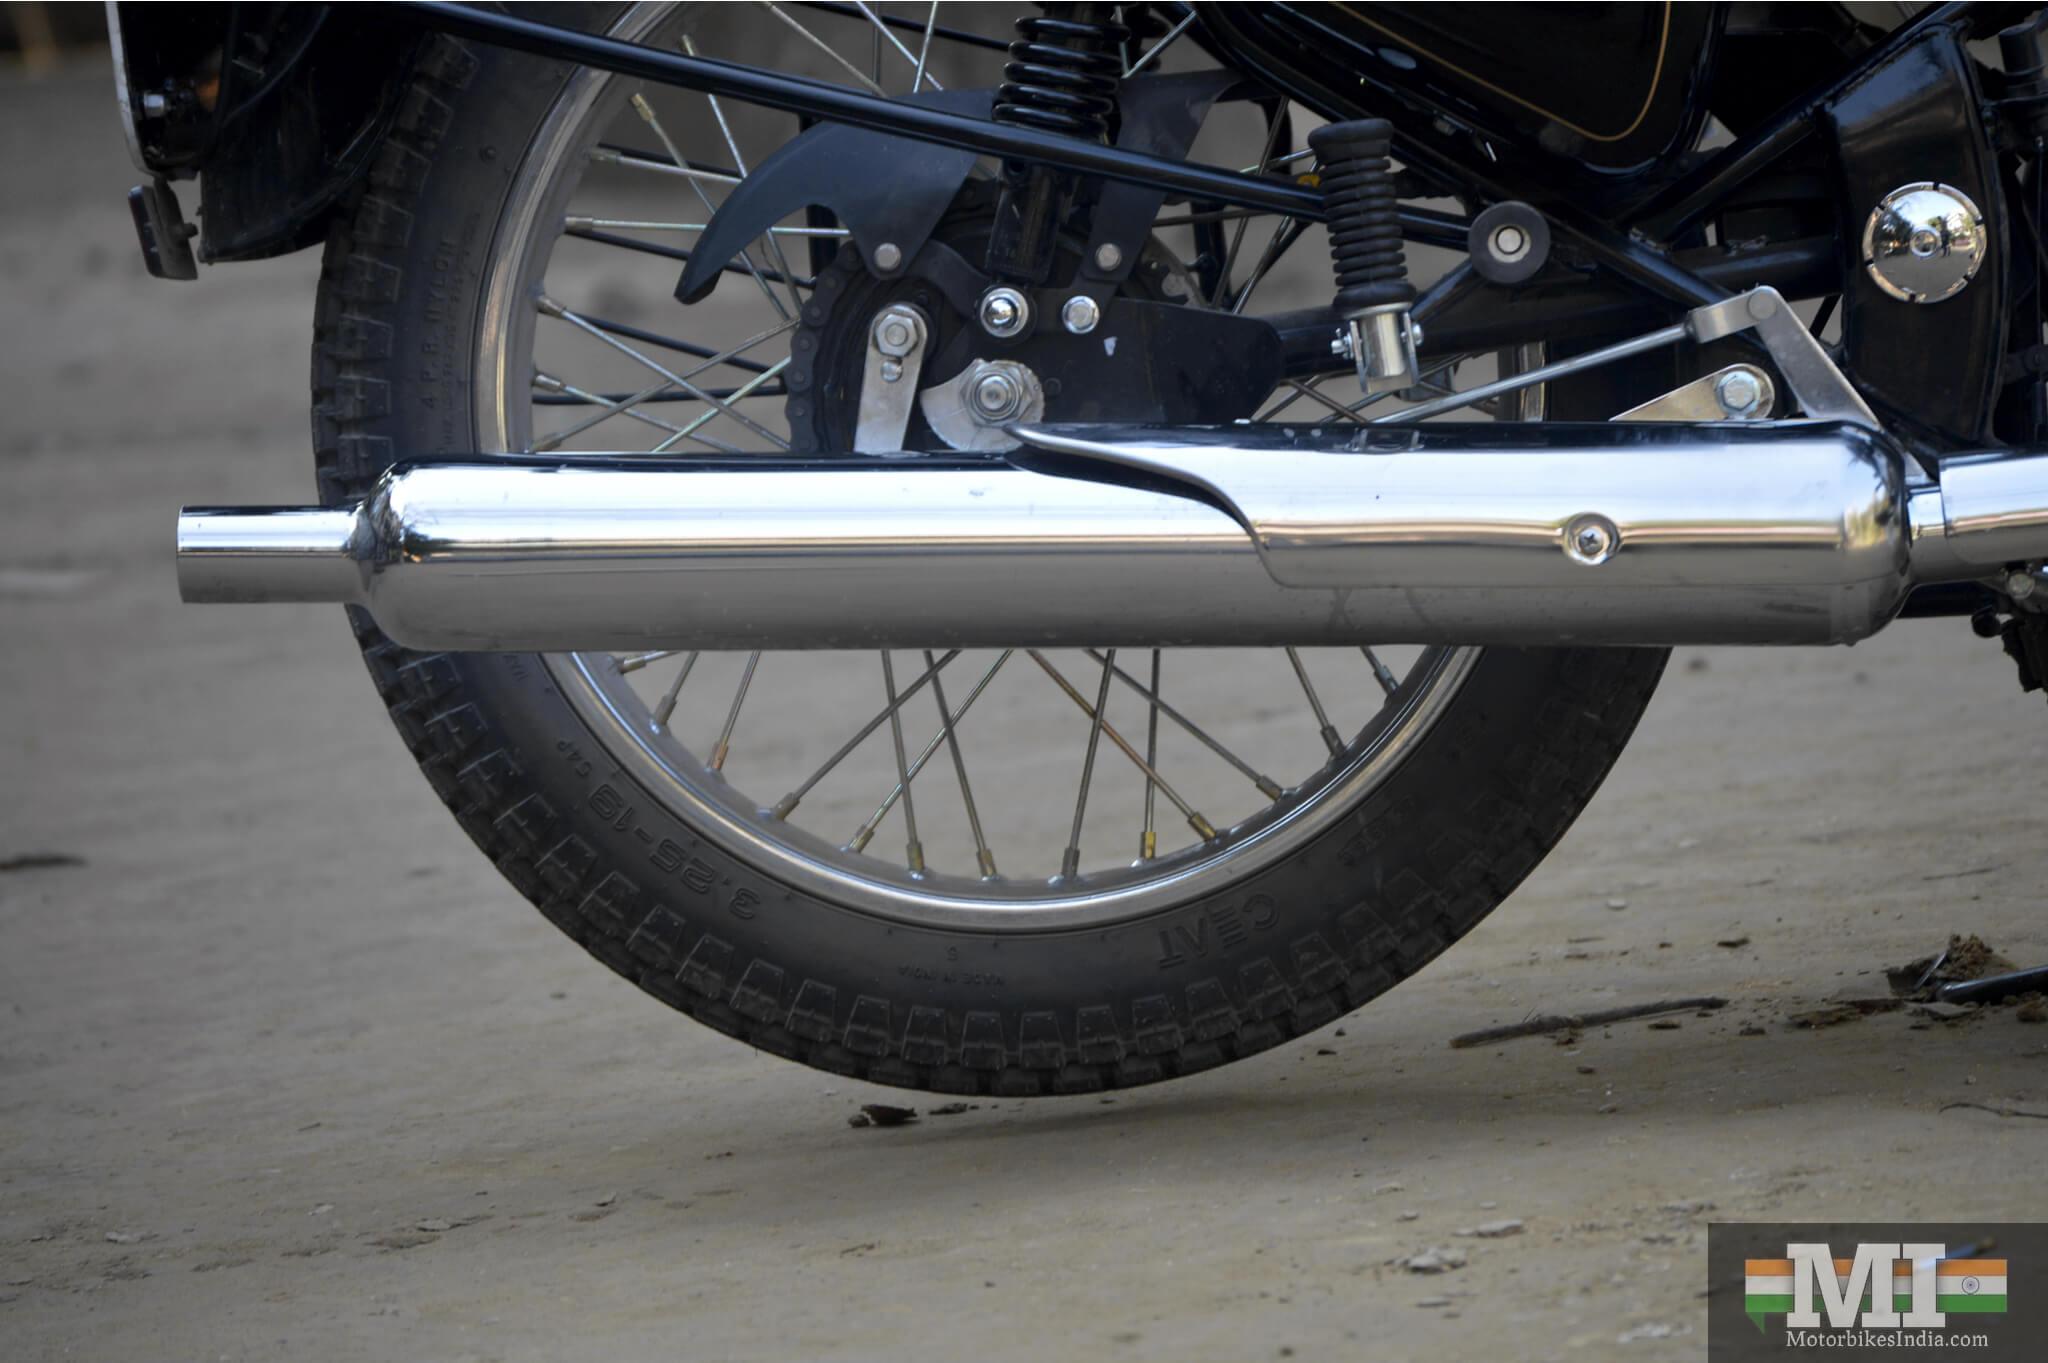 Bullet 350 Exhaust pipe